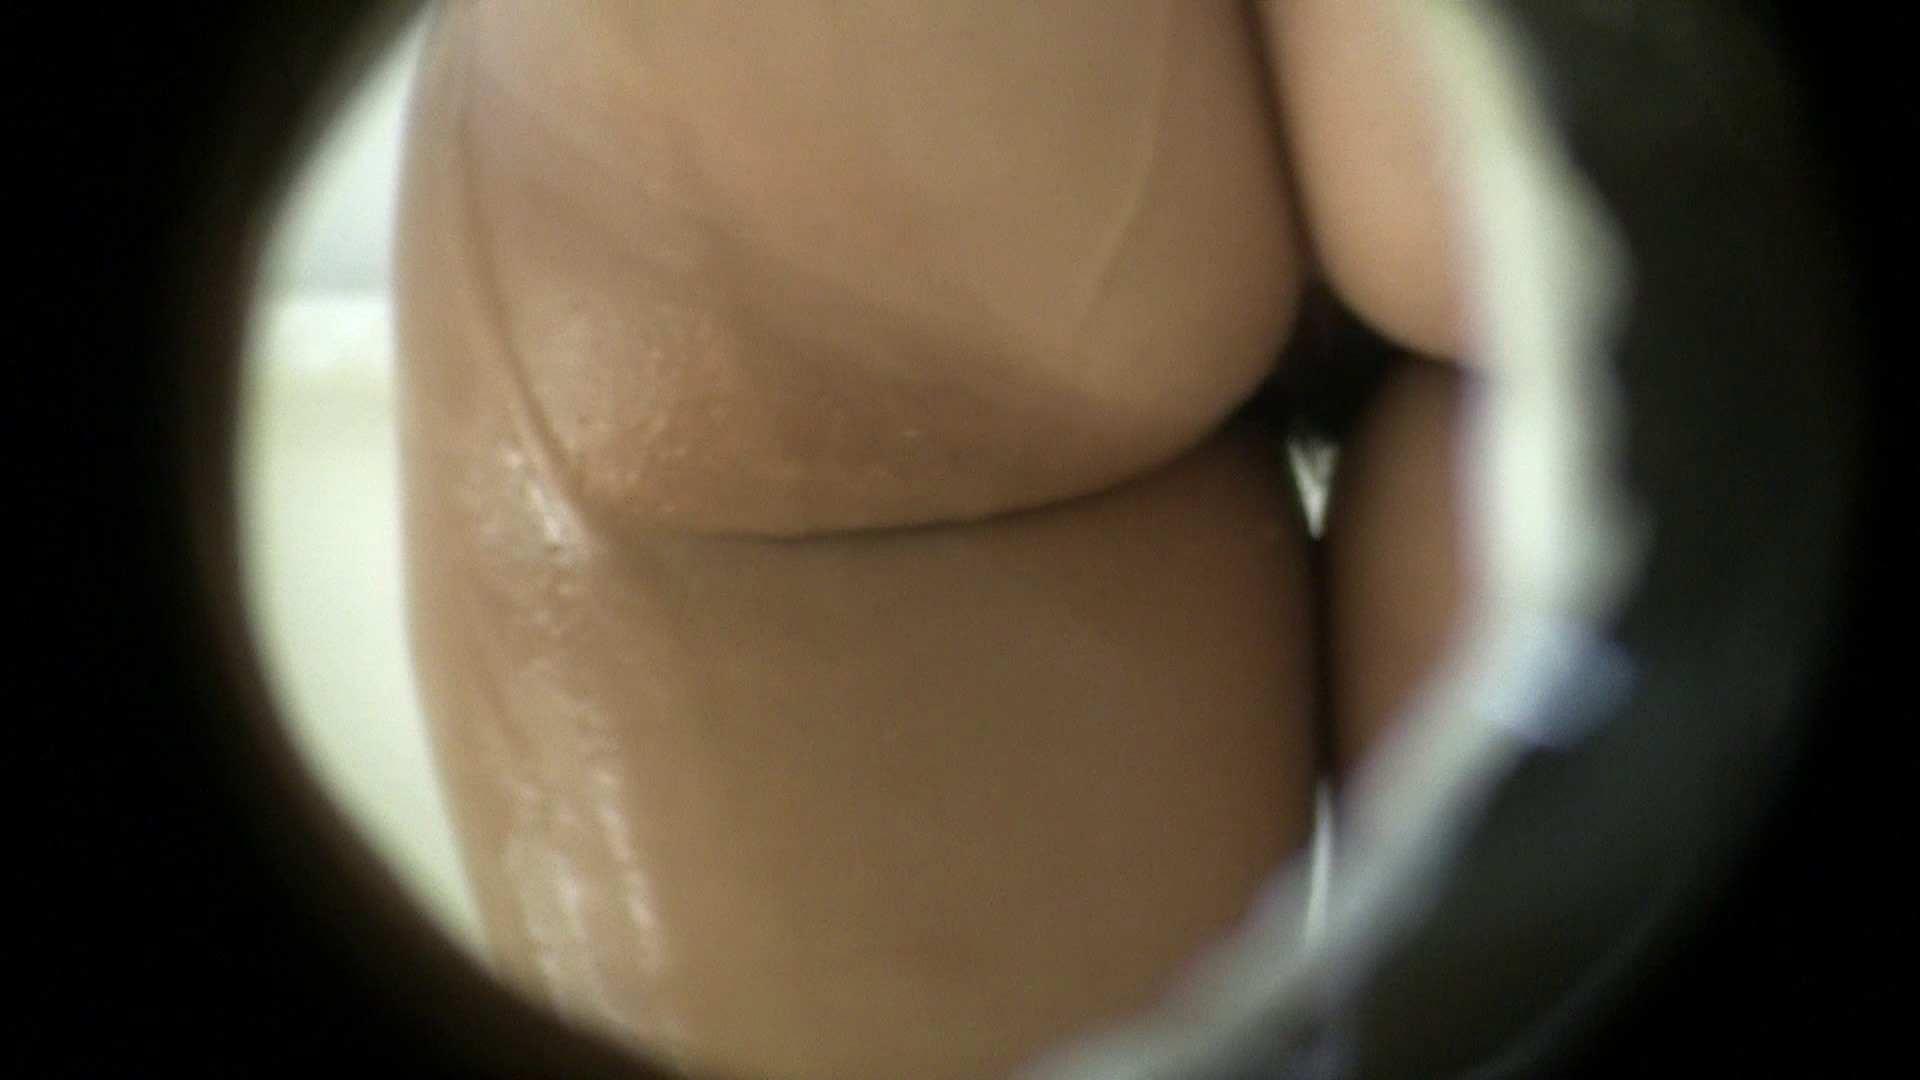 NO.10 小さな穴から一本道を狙う!! シャワー室 ワレメ無修正動画無料 99枚 57